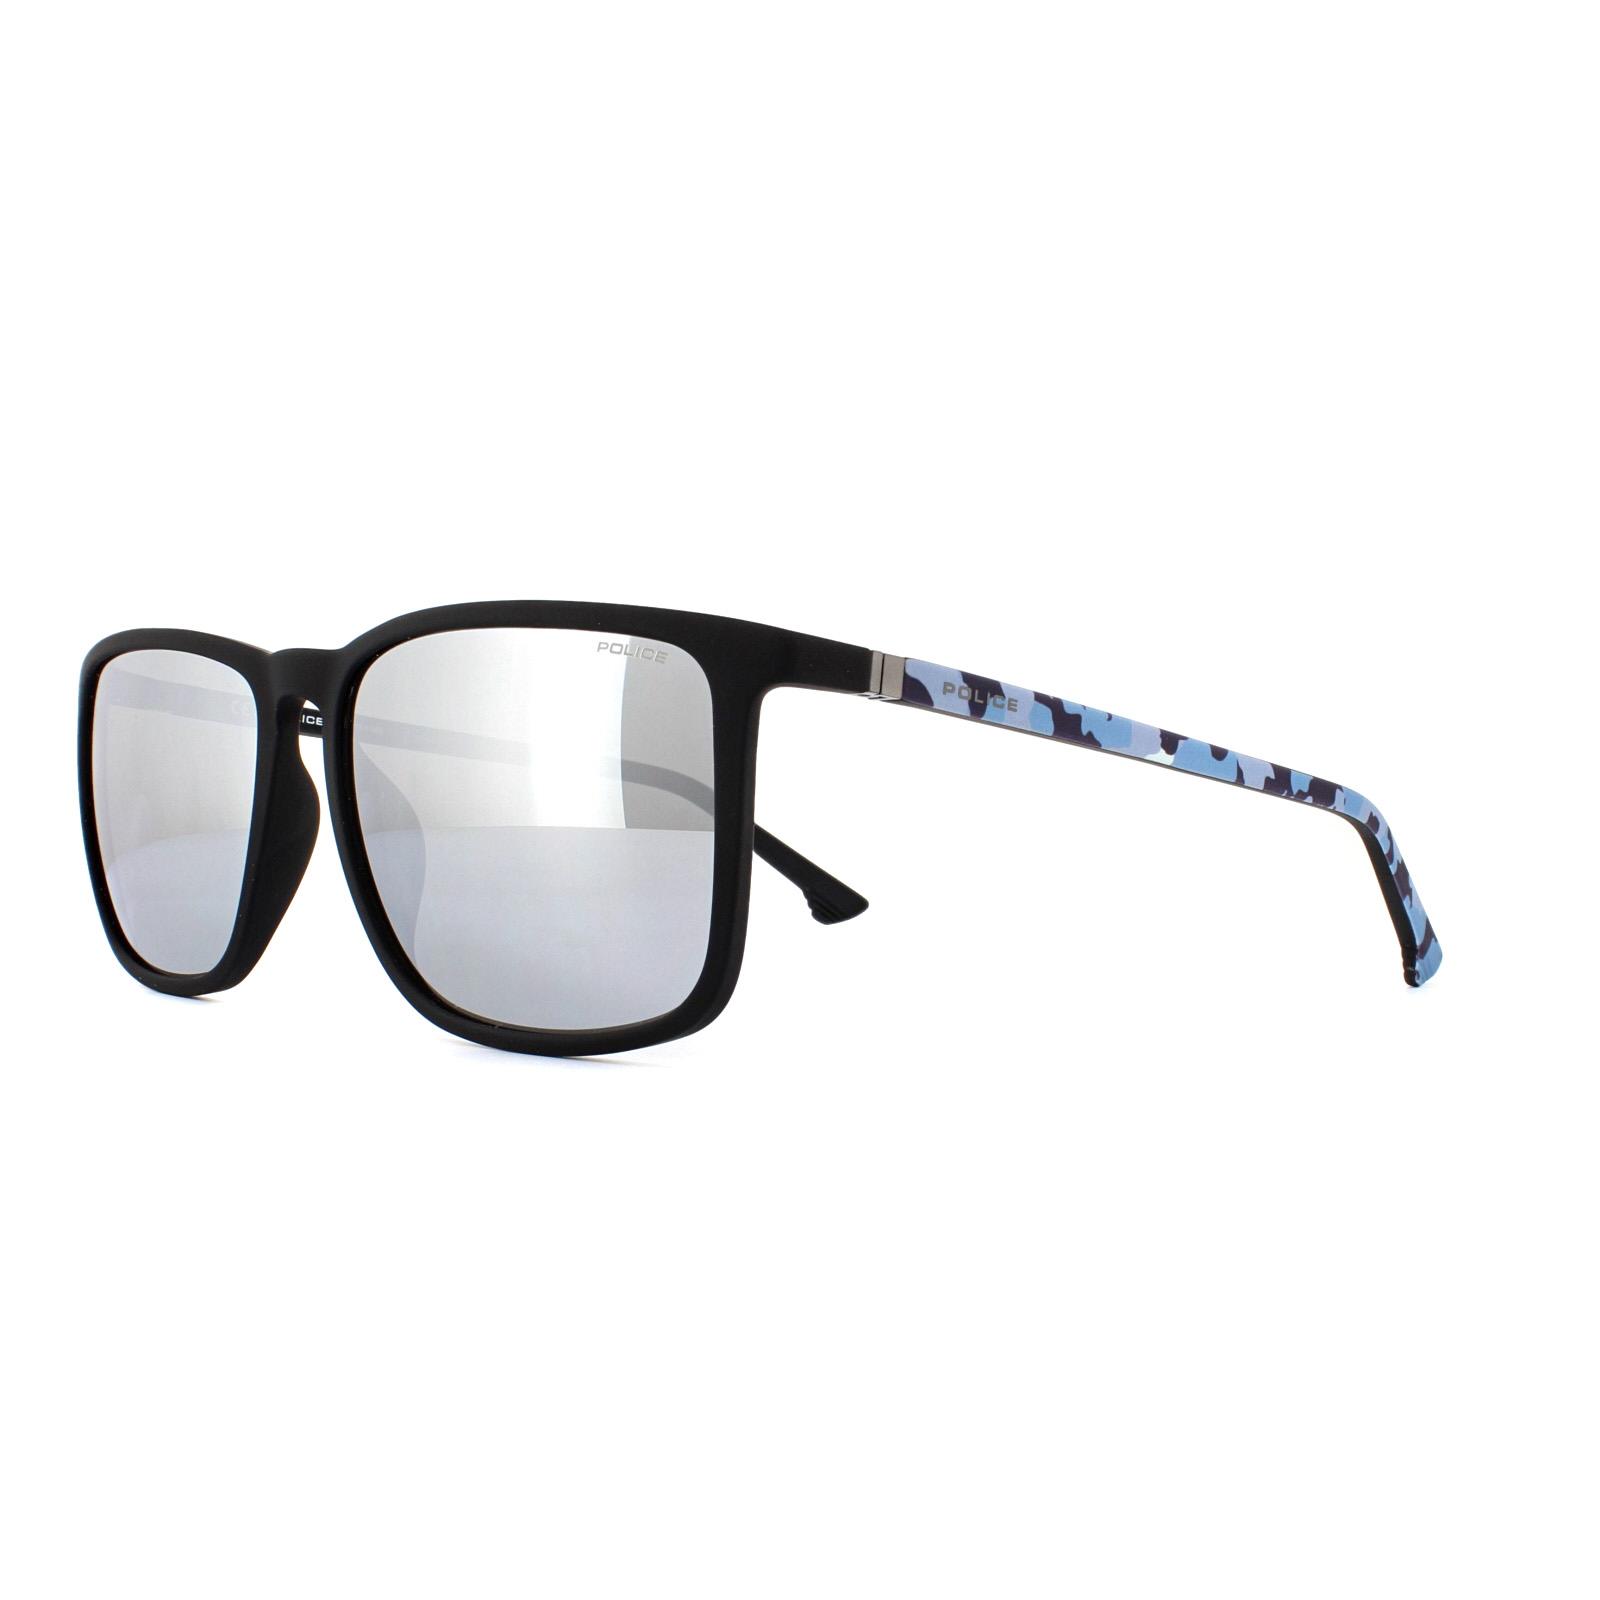 2228c31db16 Sentinel Police Sunglasses SPL342M Jungle 1 6AAX Rubberized Black Blue  Silver Mirror. Sentinel Thumbnail 2